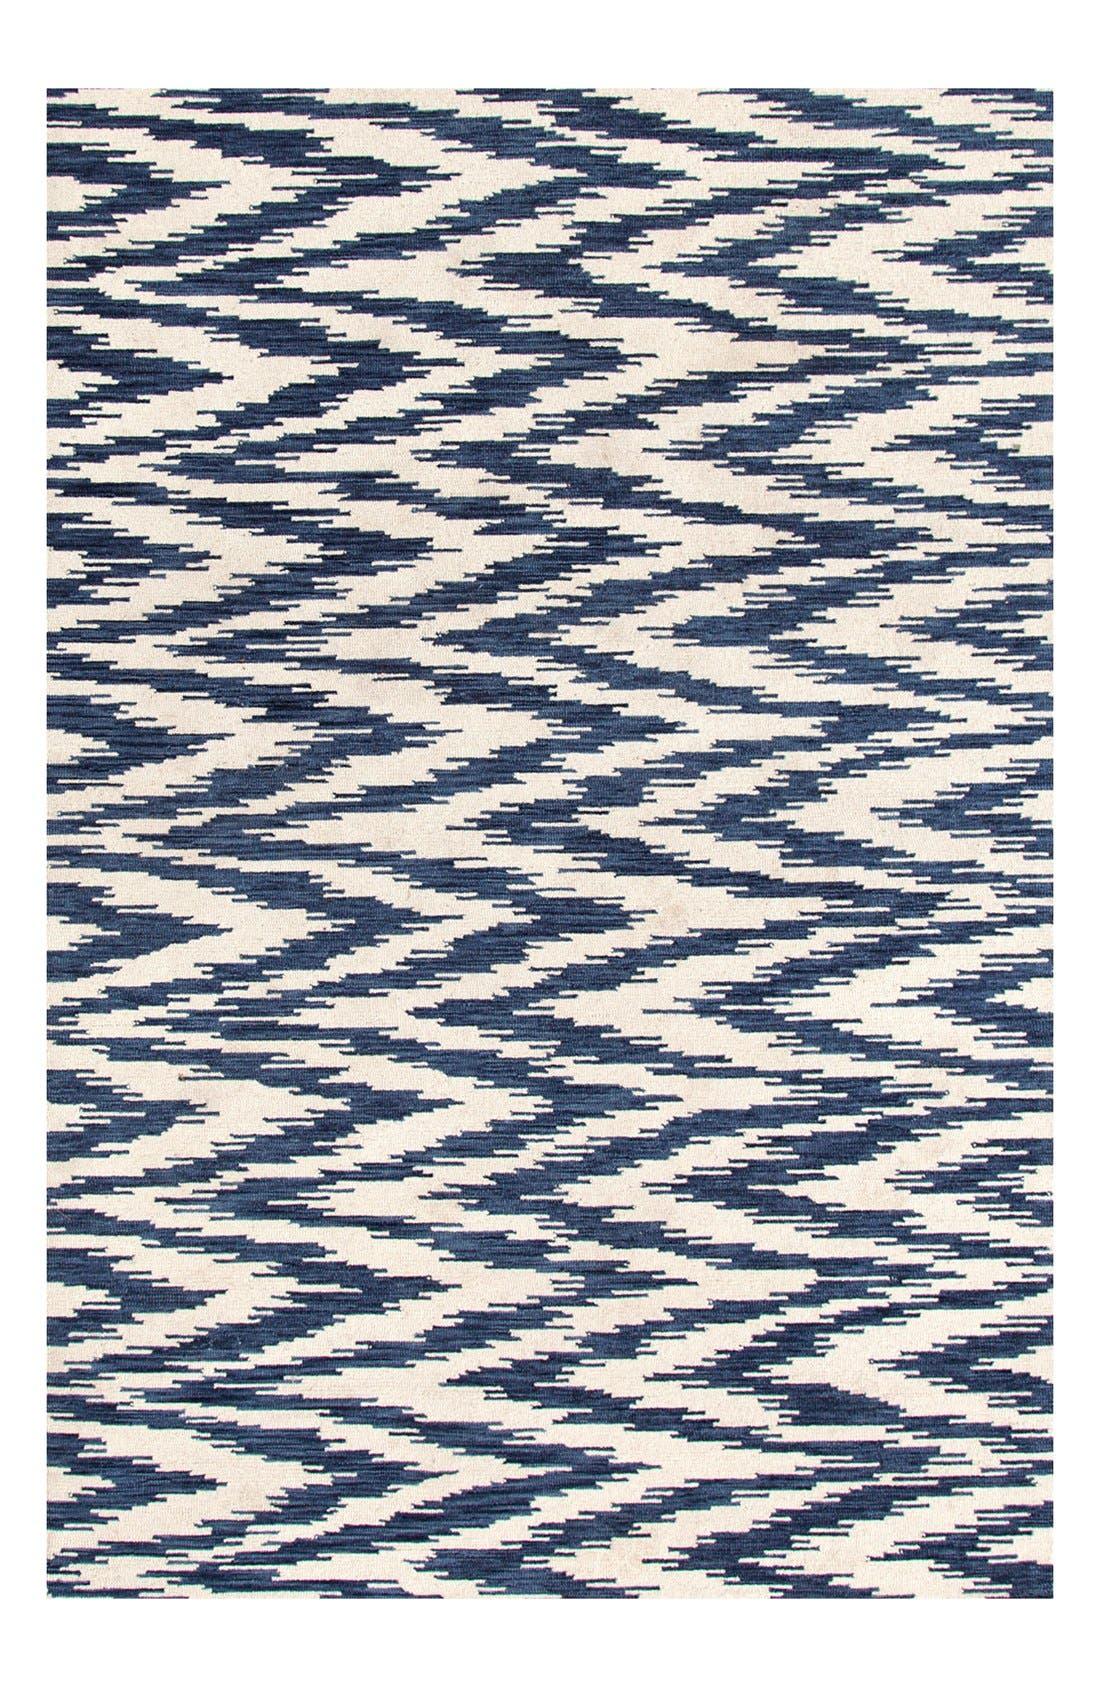 'Chekat Ink' Wool Rug,                             Main thumbnail 1, color,                             BLUE